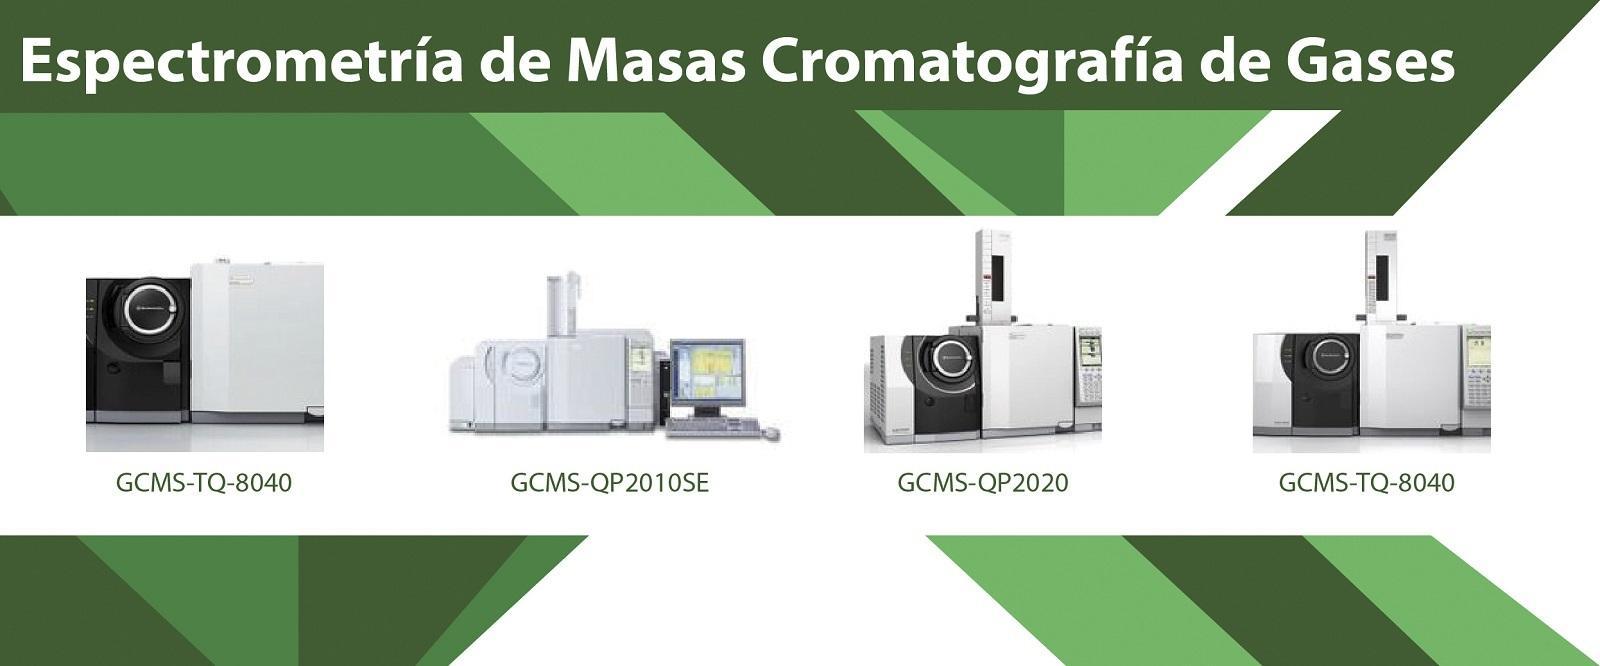 espectrometria-de-masas-cromtografia-de-gases-rotador-is-analitica